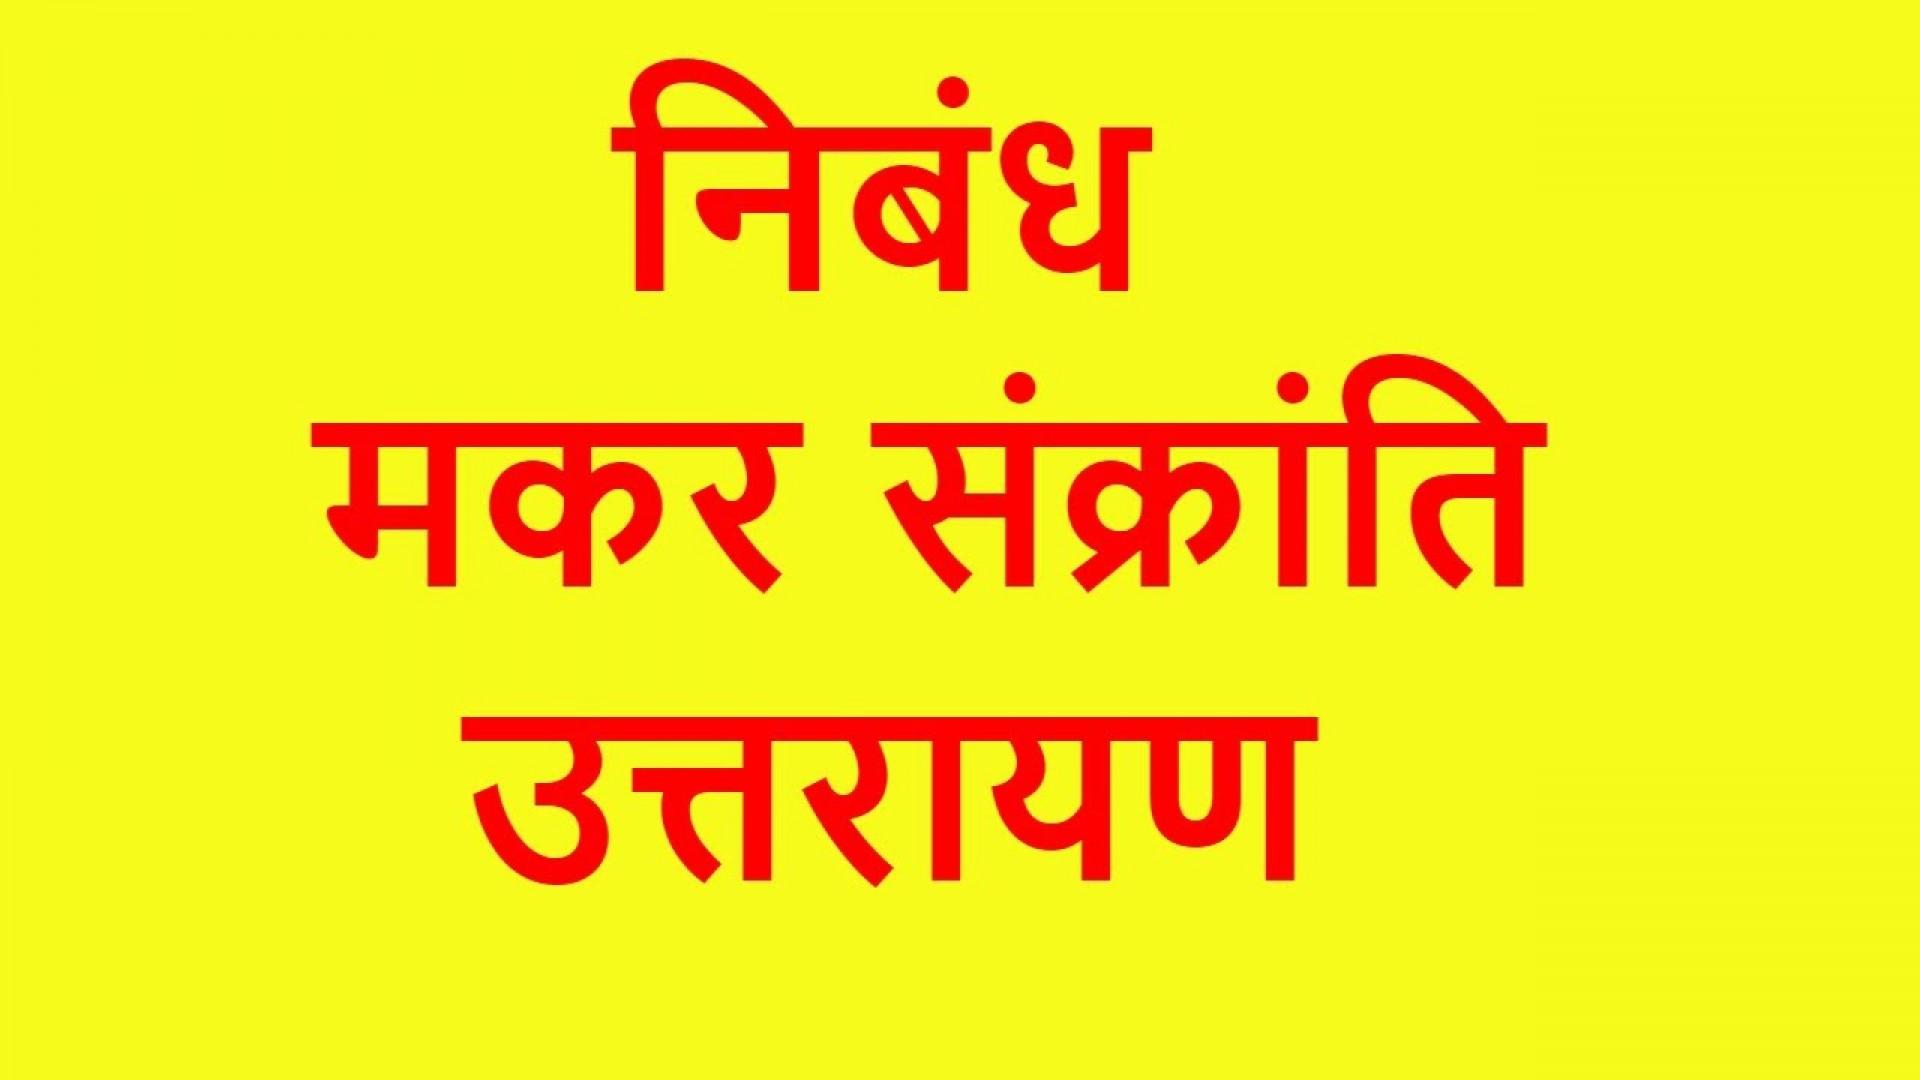 001 Maxresdefault Makar Sankranti In Hindi Essay Surprising Pdf Download 2018 1920